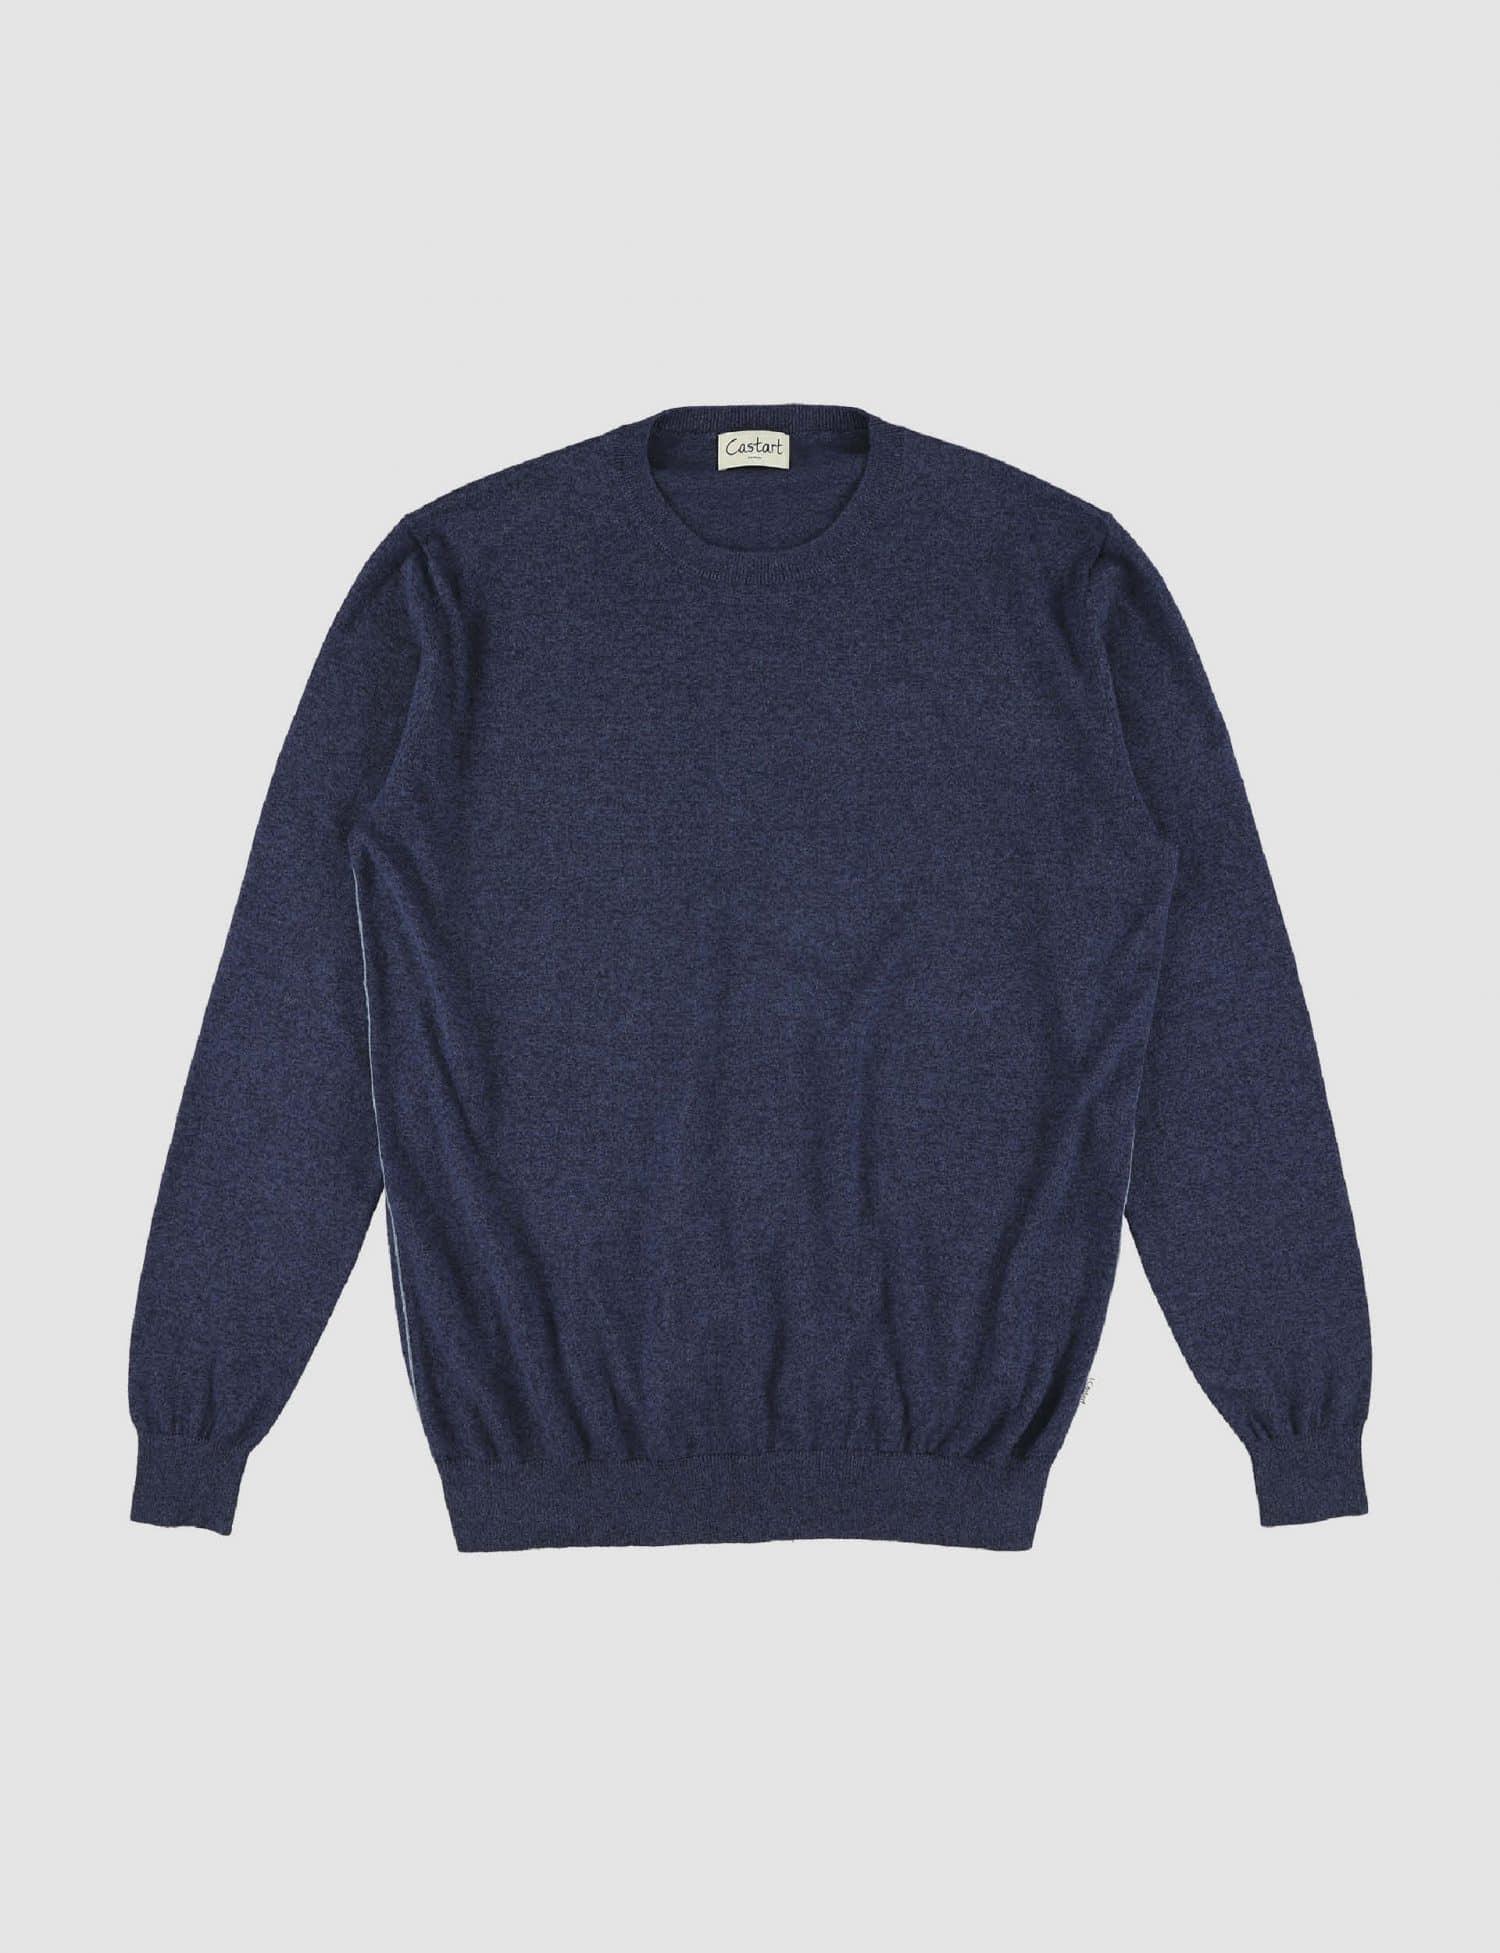 Fordham - Navy Blue